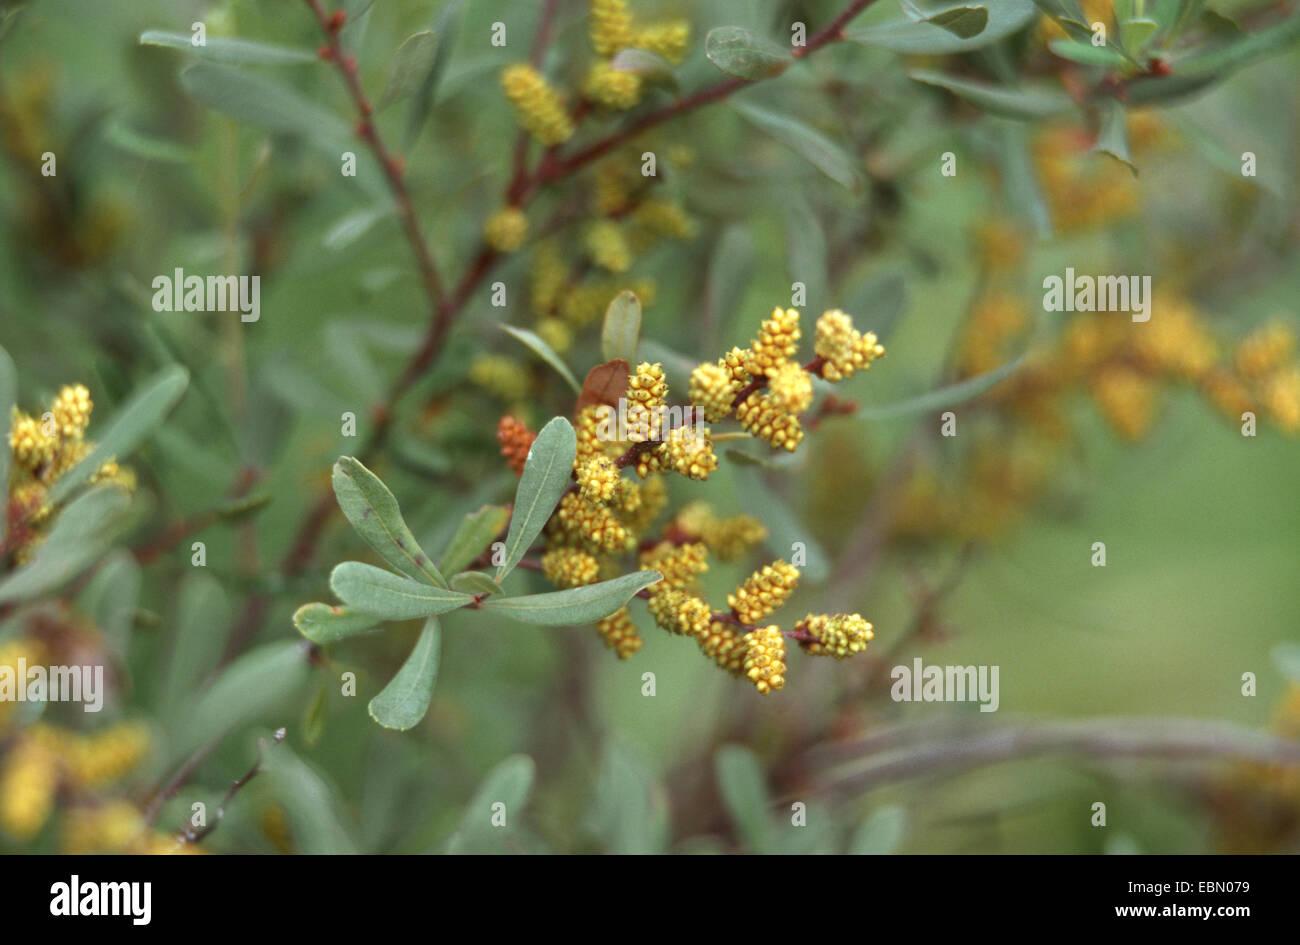 bog myrtle, sweet gale, sweet bayberry (Myrica gale), blooming, Germany - Stock Image